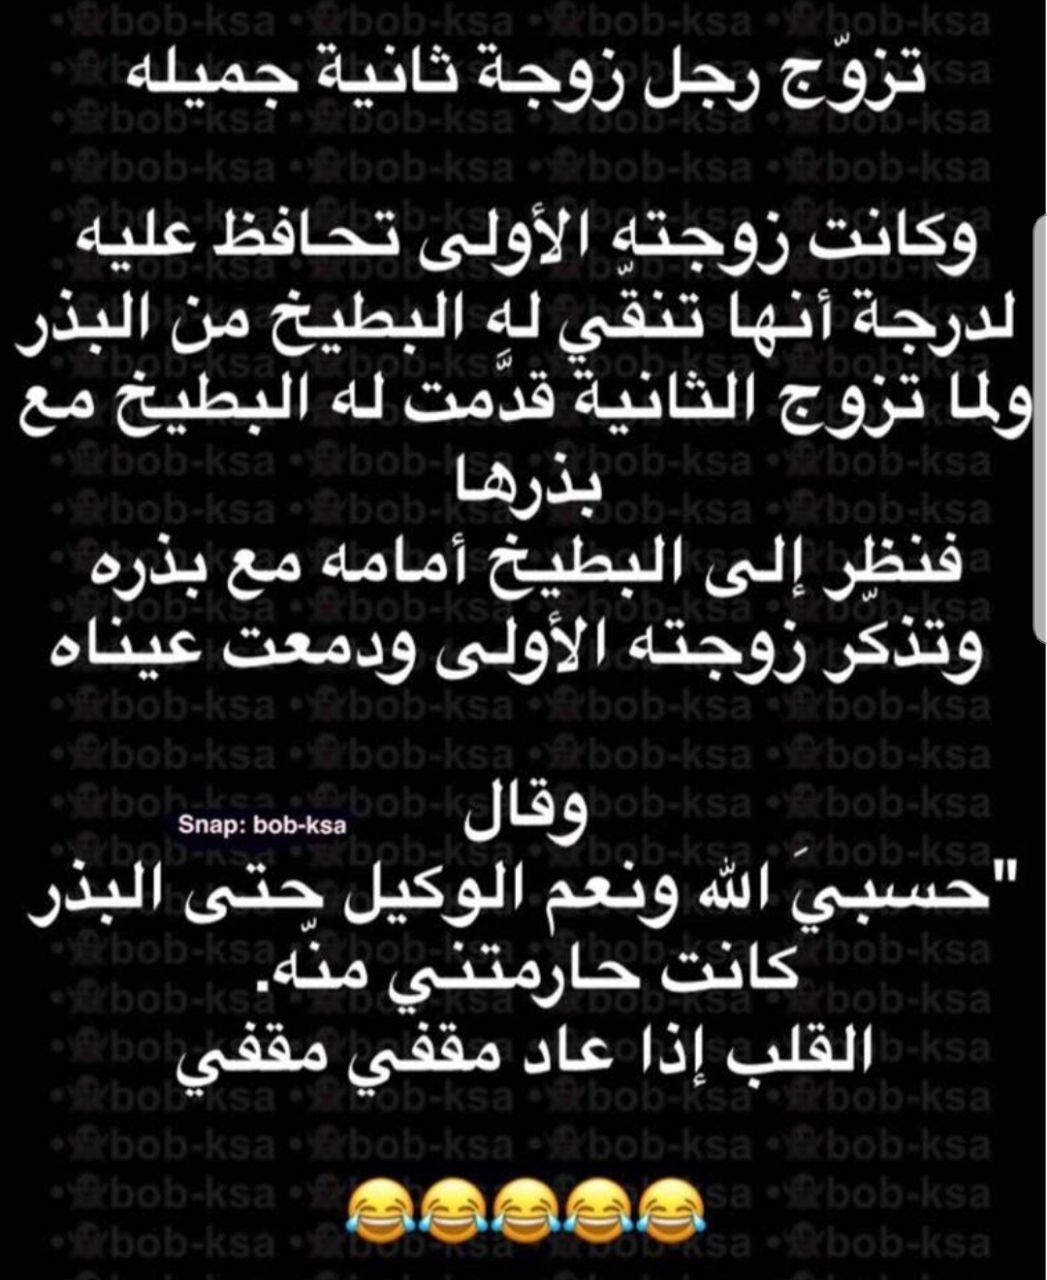 Pin By Nails On كل على همه سرى وزارة الضحك Pretty Words Words Quotes Arabic Funny